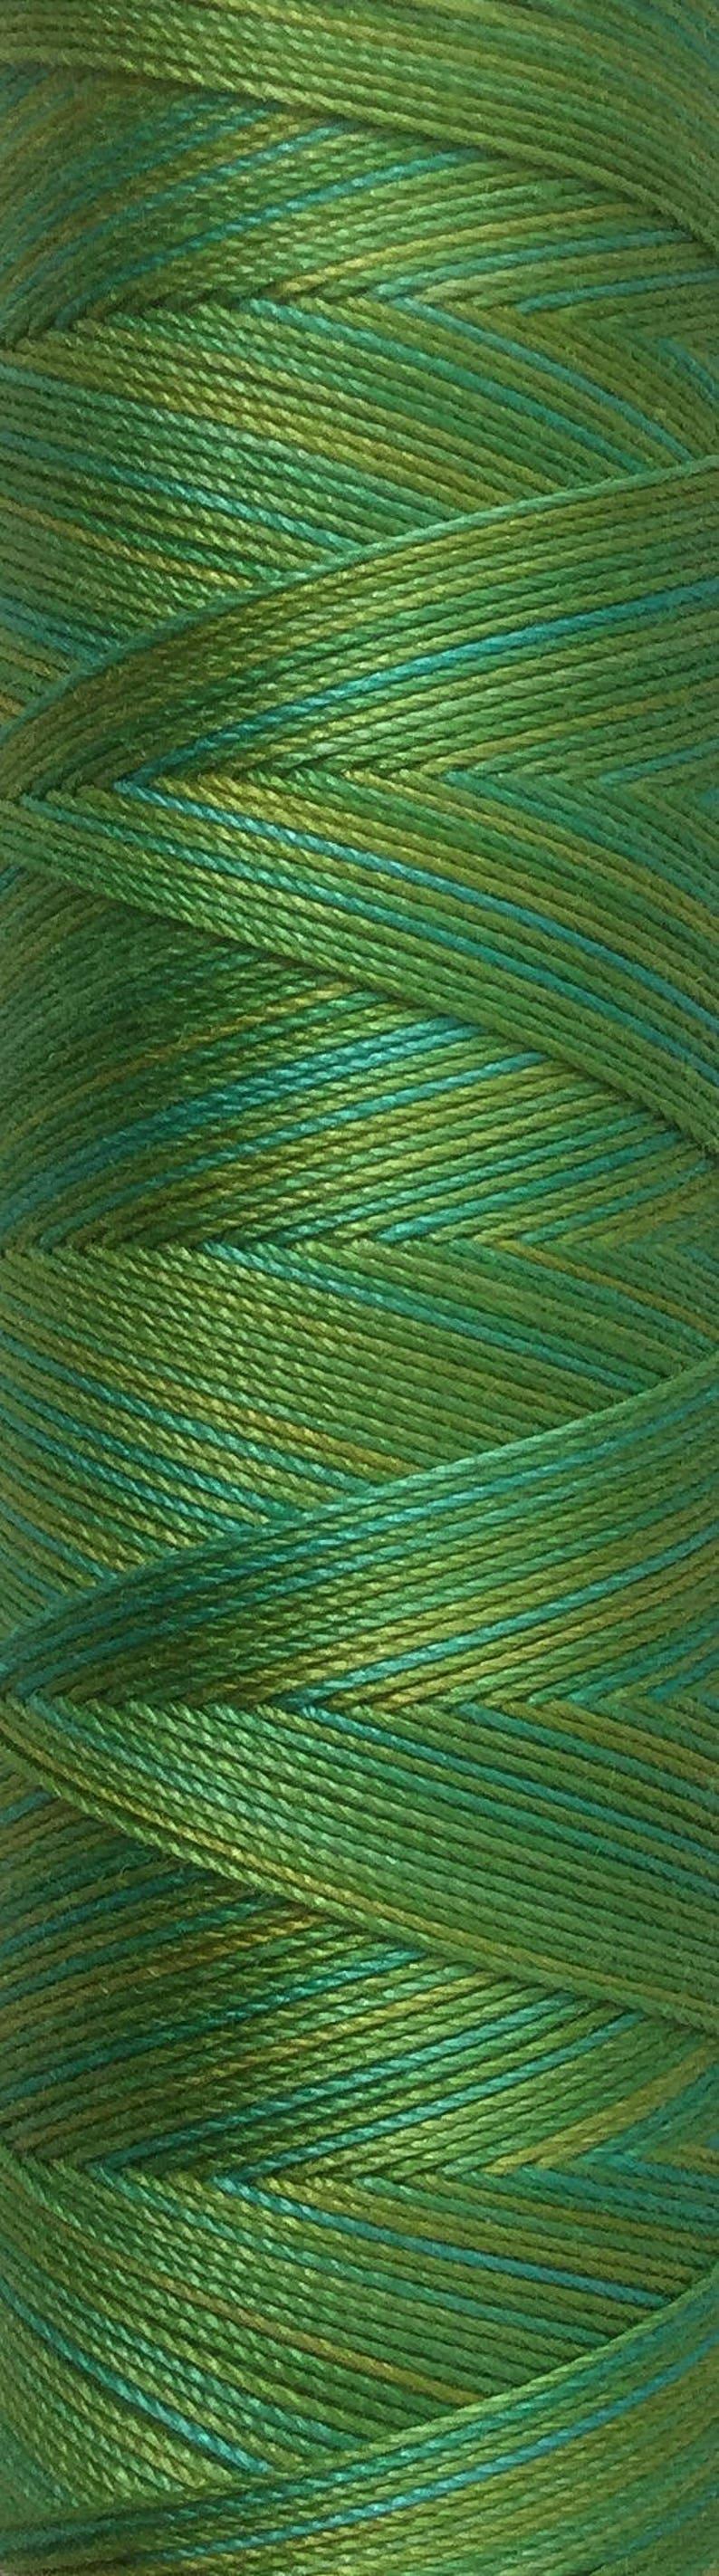 No.45 Spring Green Hand Dyed Cotton Machine Thread image 0